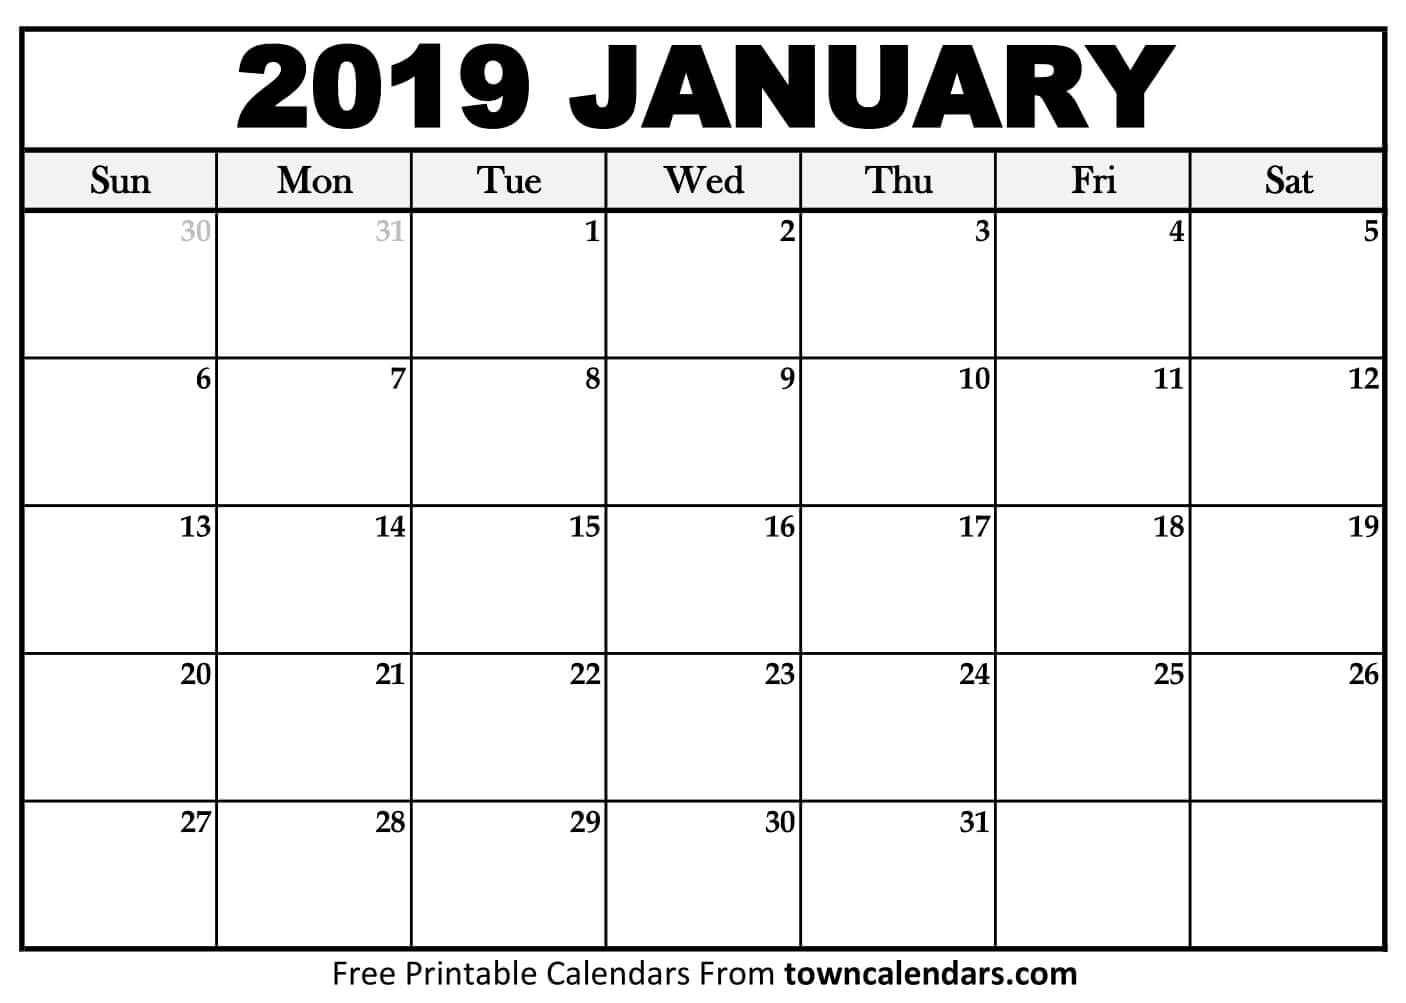 Printable January 2019 Calendar towncalendars